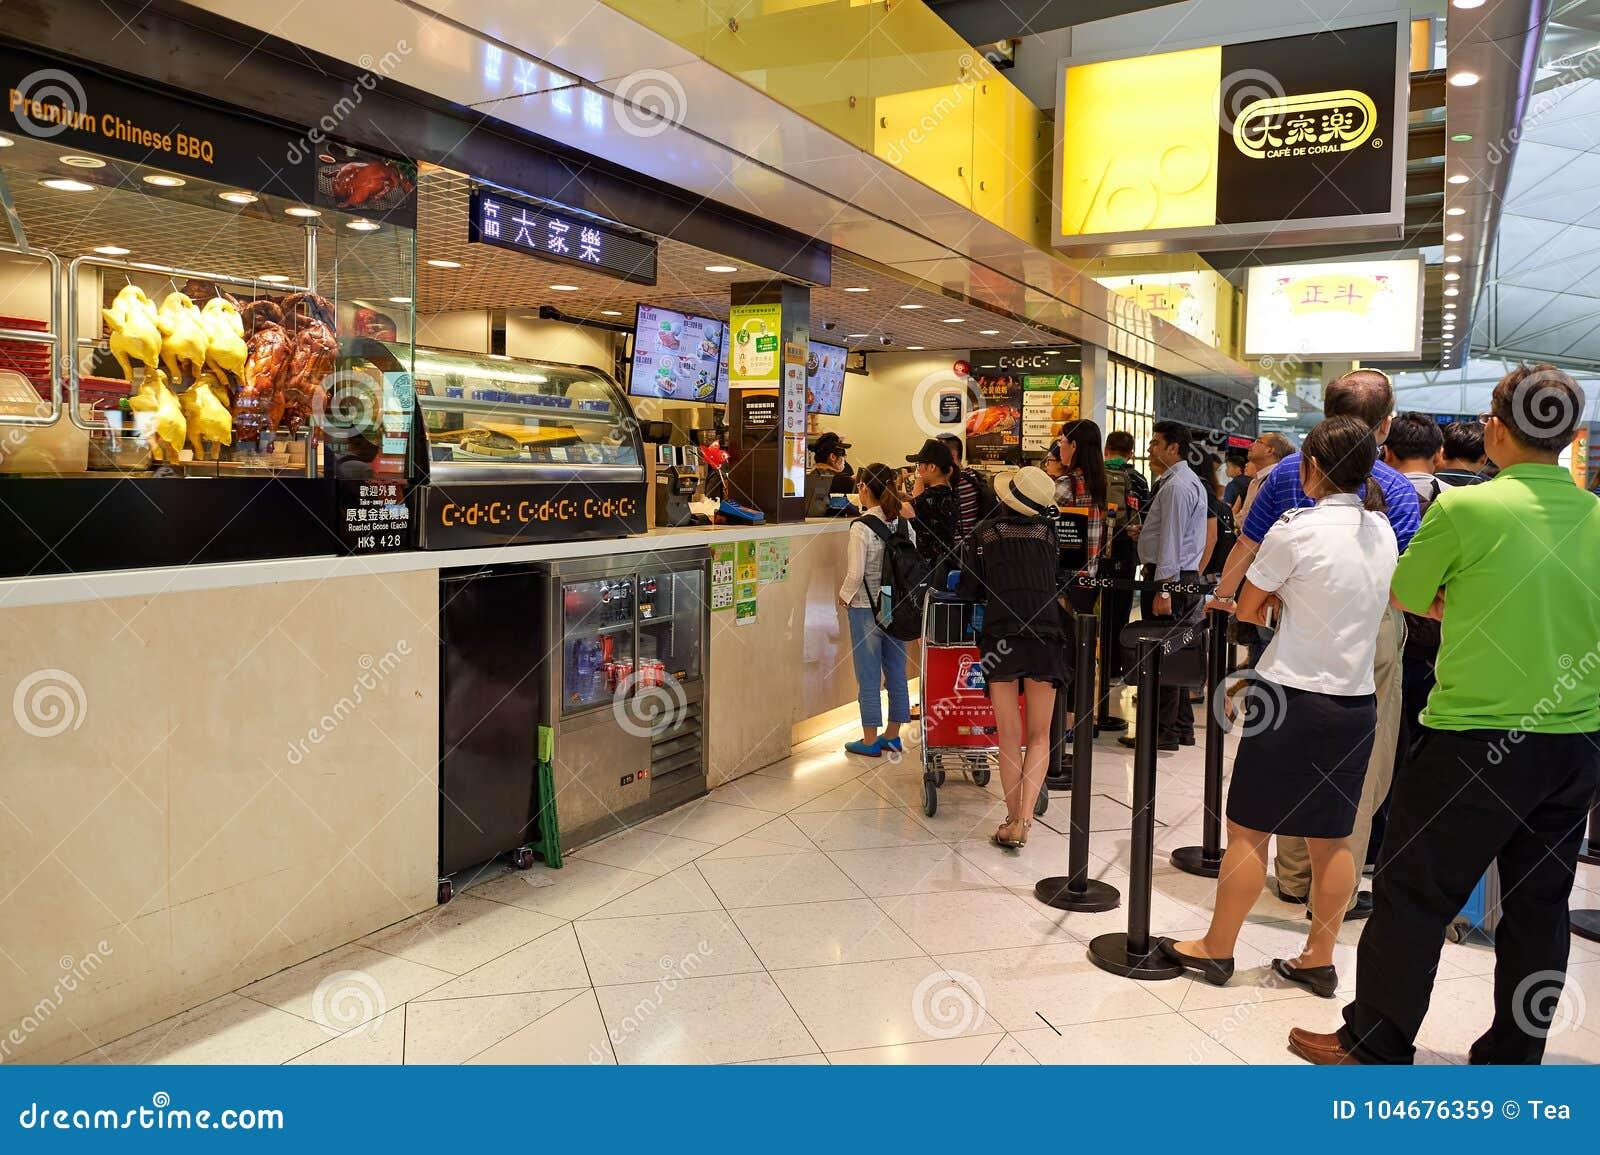 b379556e4e Hong Kong International Airport Editorial Stock Image - Image of ...